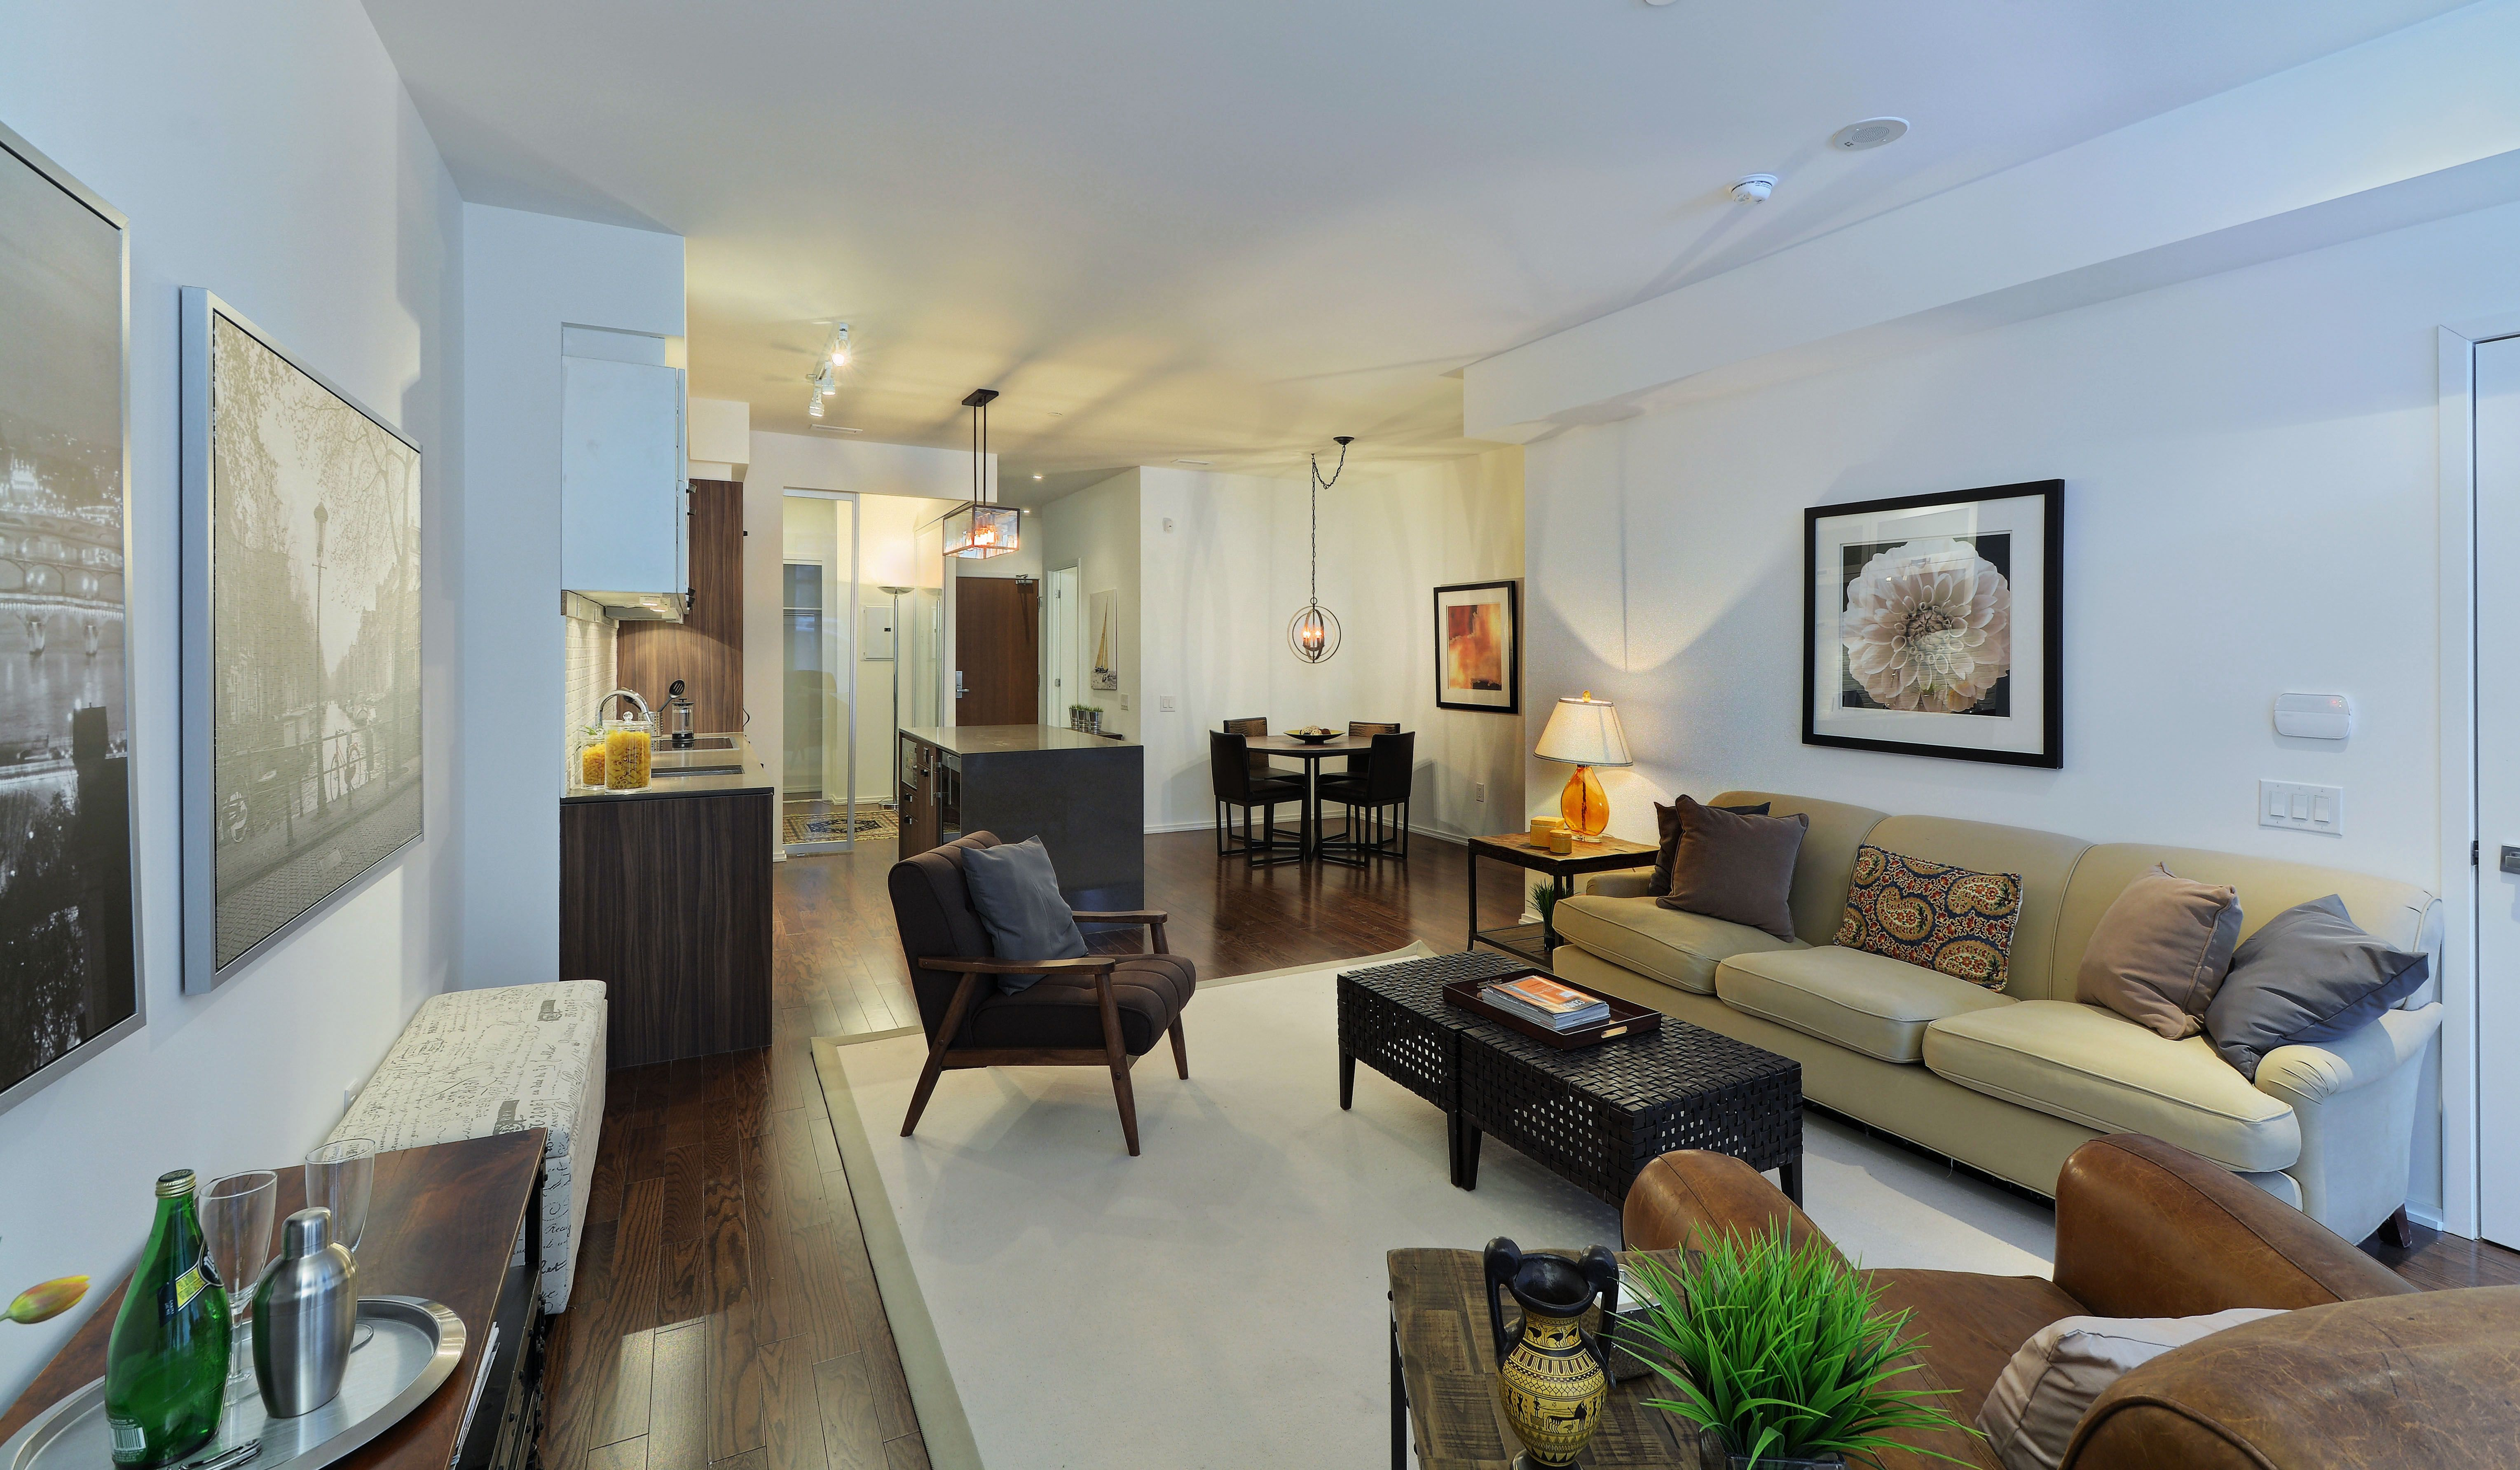 B.streets living room